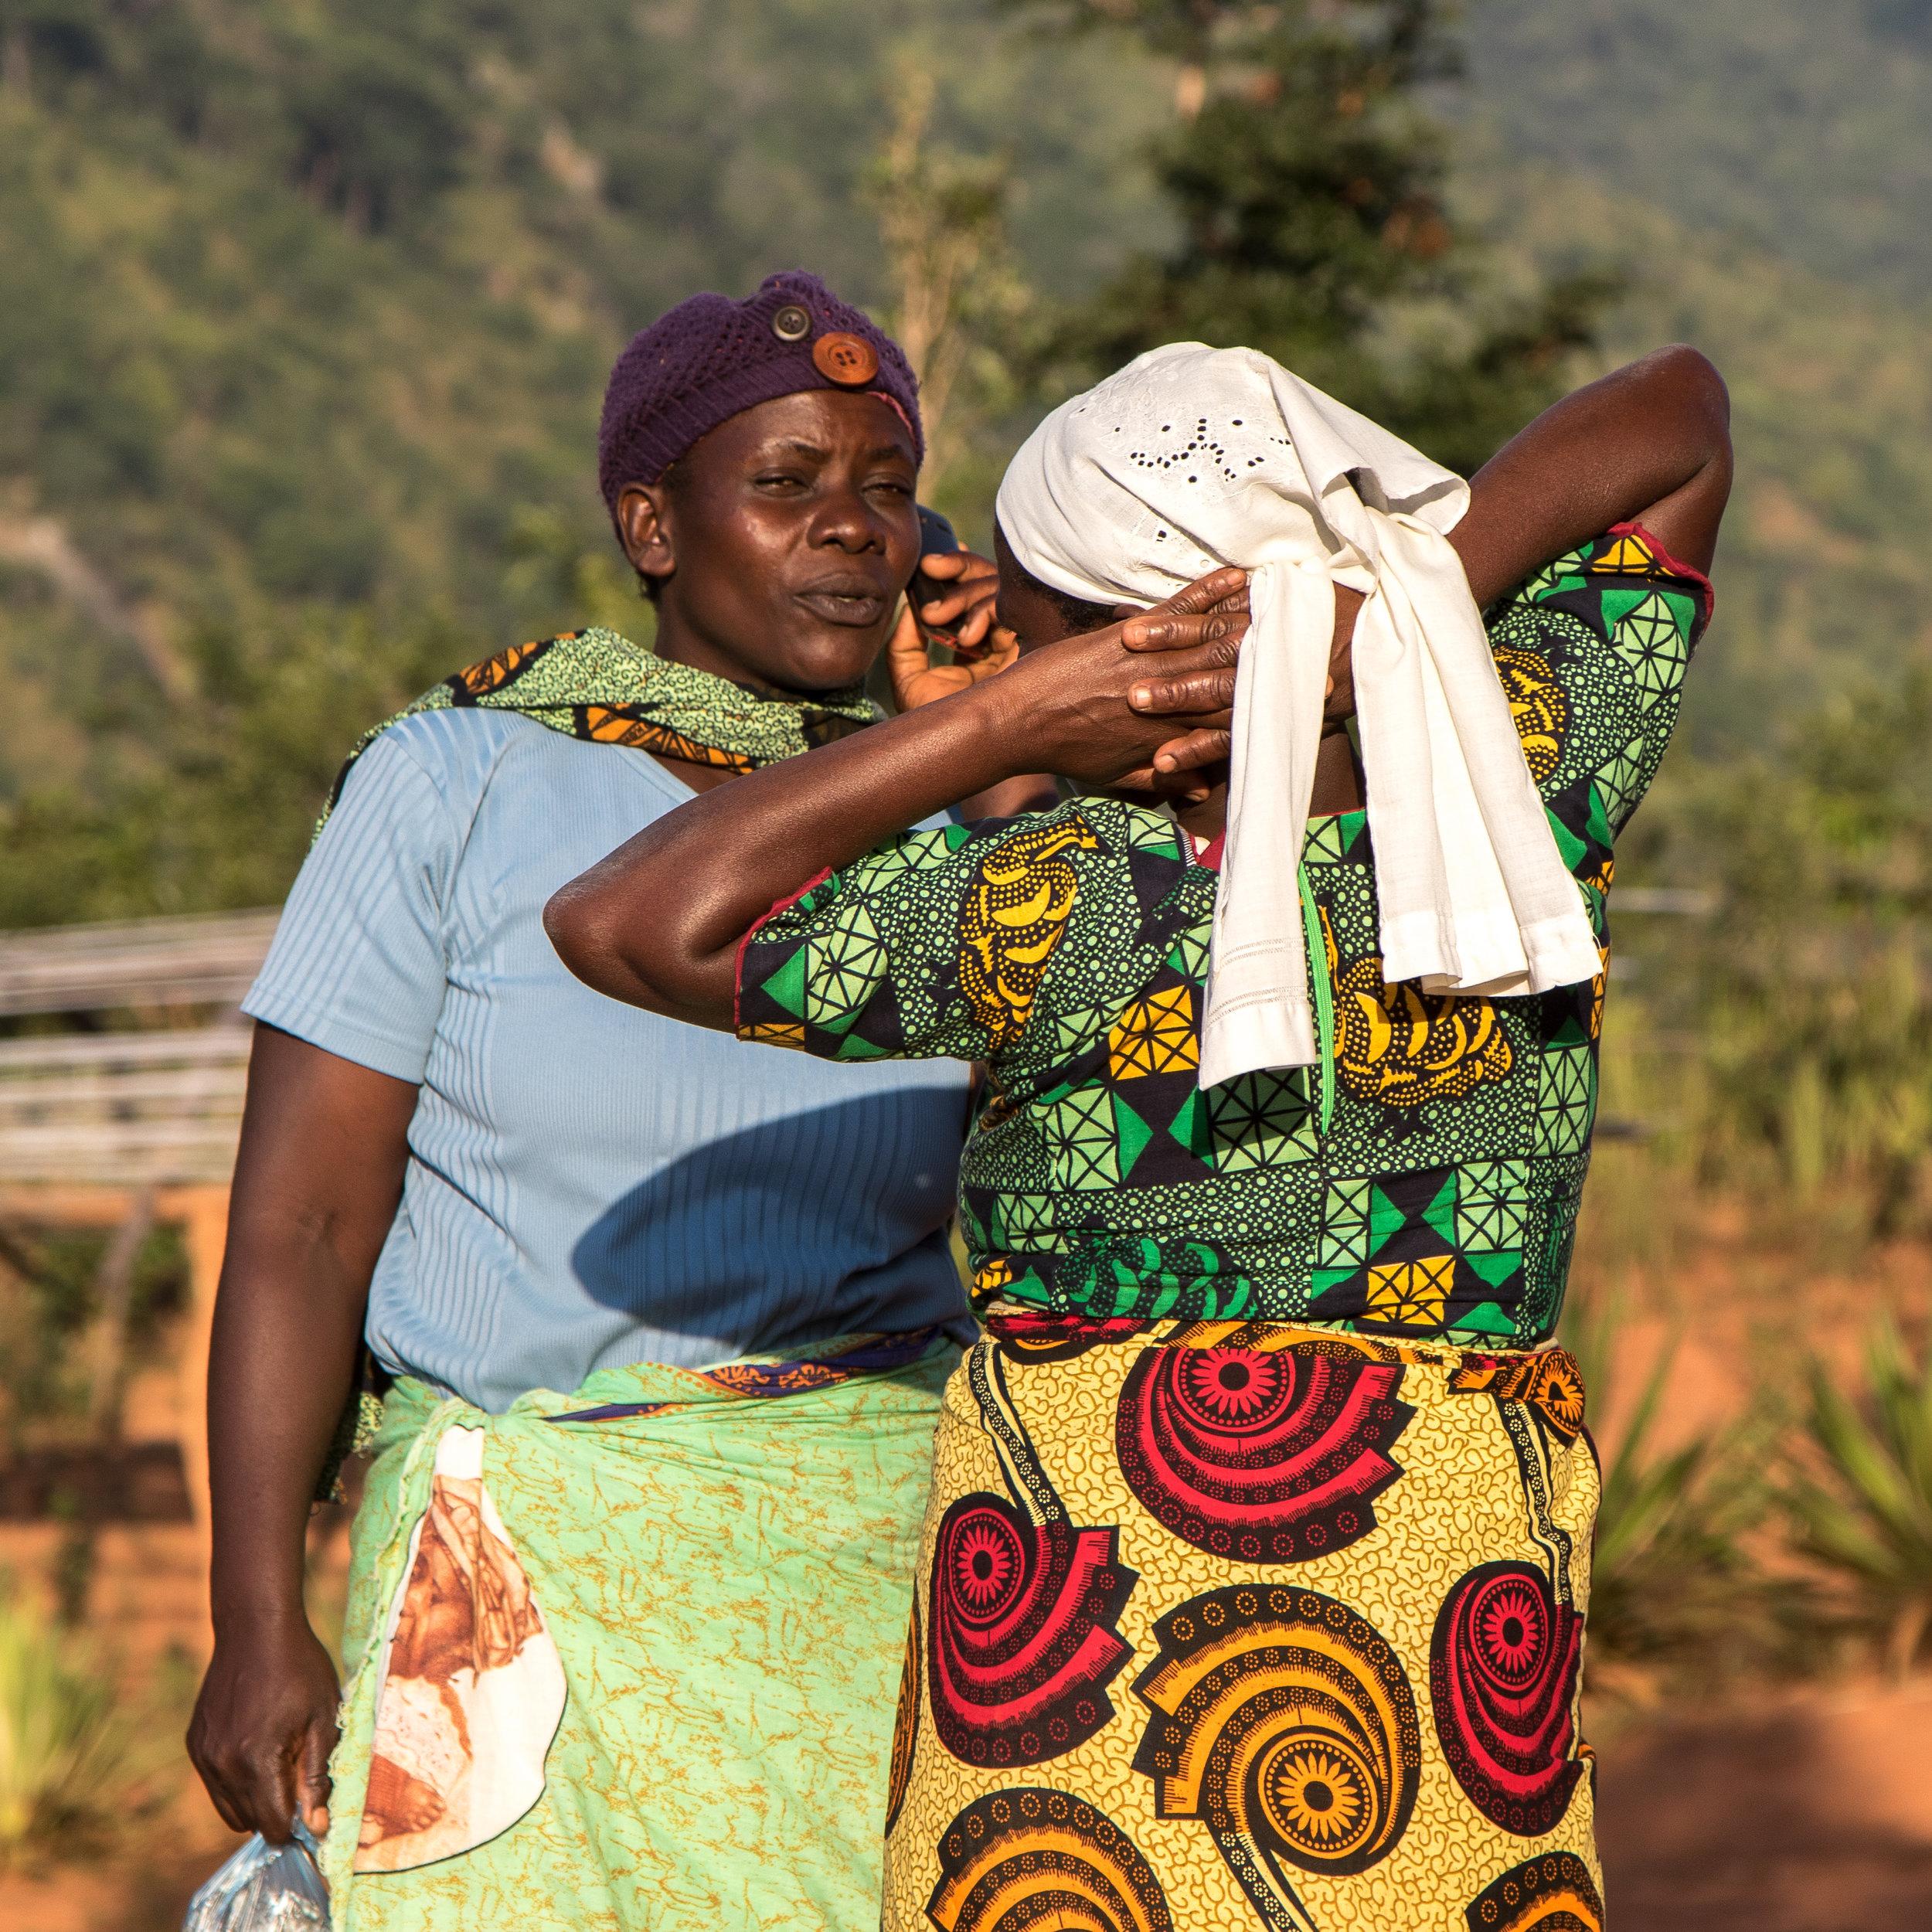 Adam Dickens Photography Malawi 2015 - 4885.jpg